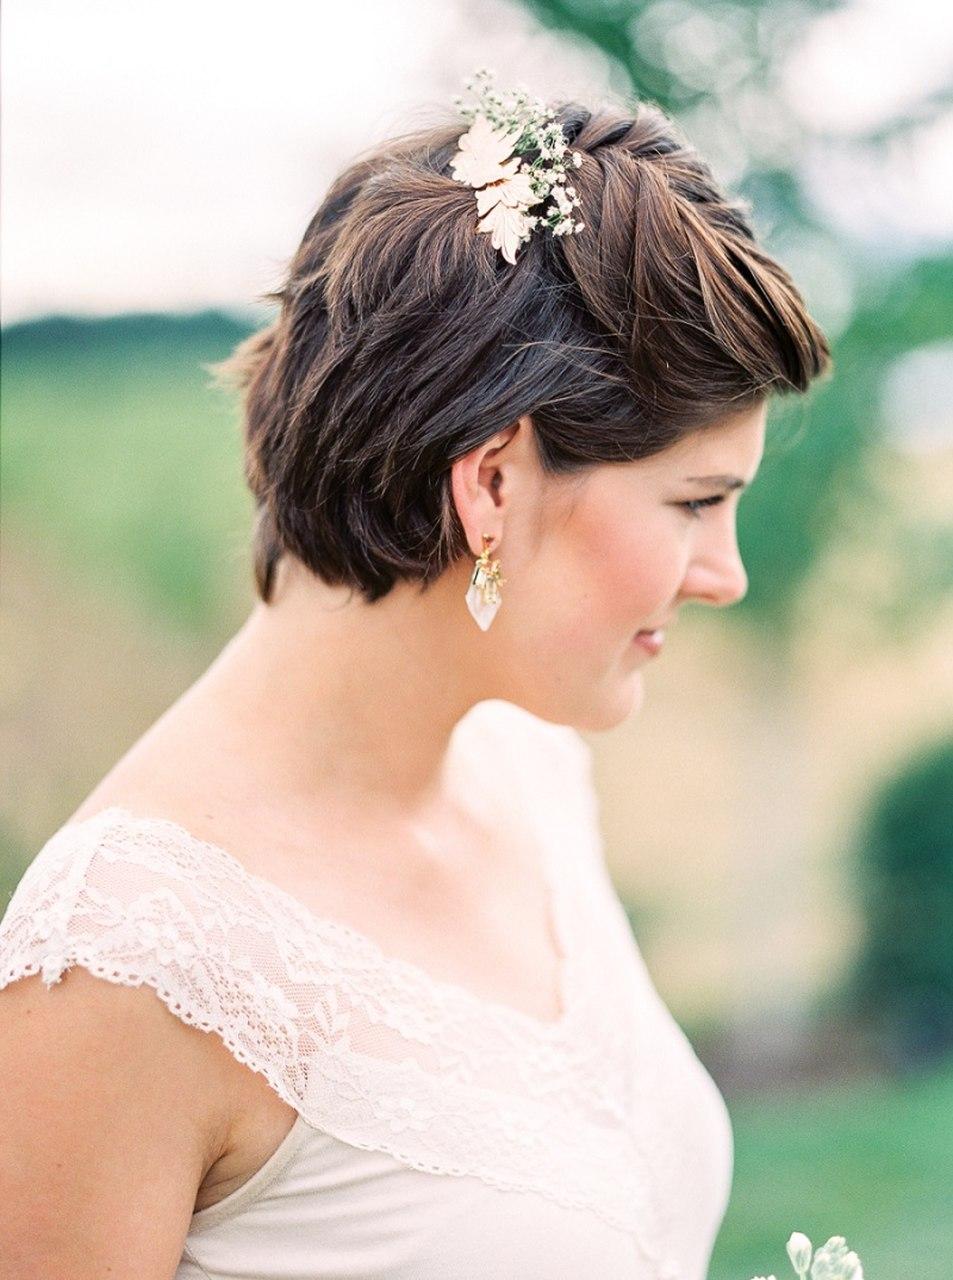 penteados para cabelos curtos para casamento